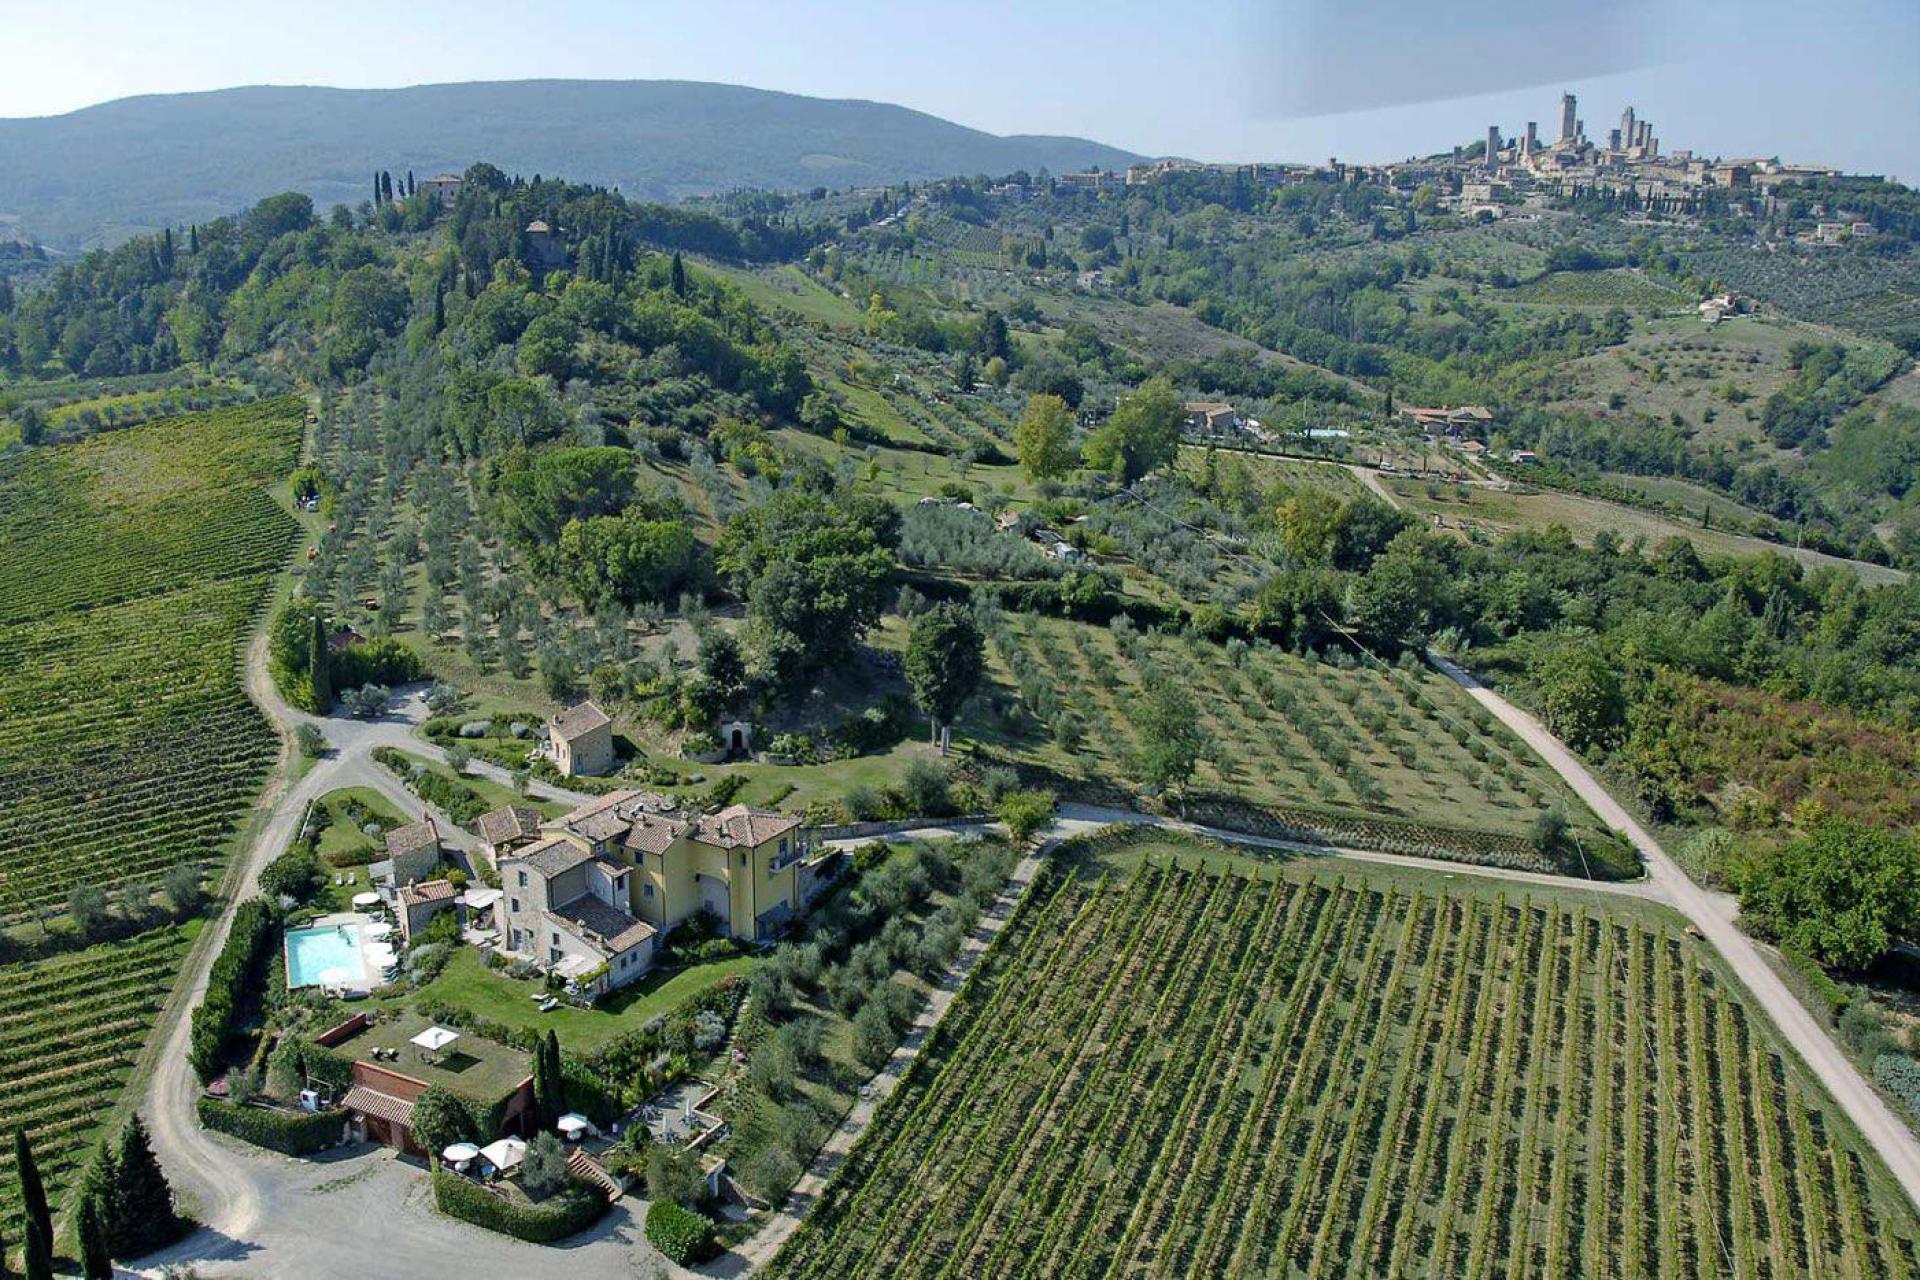 Agriturismo Toskana Kleiner Agriturismo mit Ausblick auf San Gimignano   myitalyselection.de